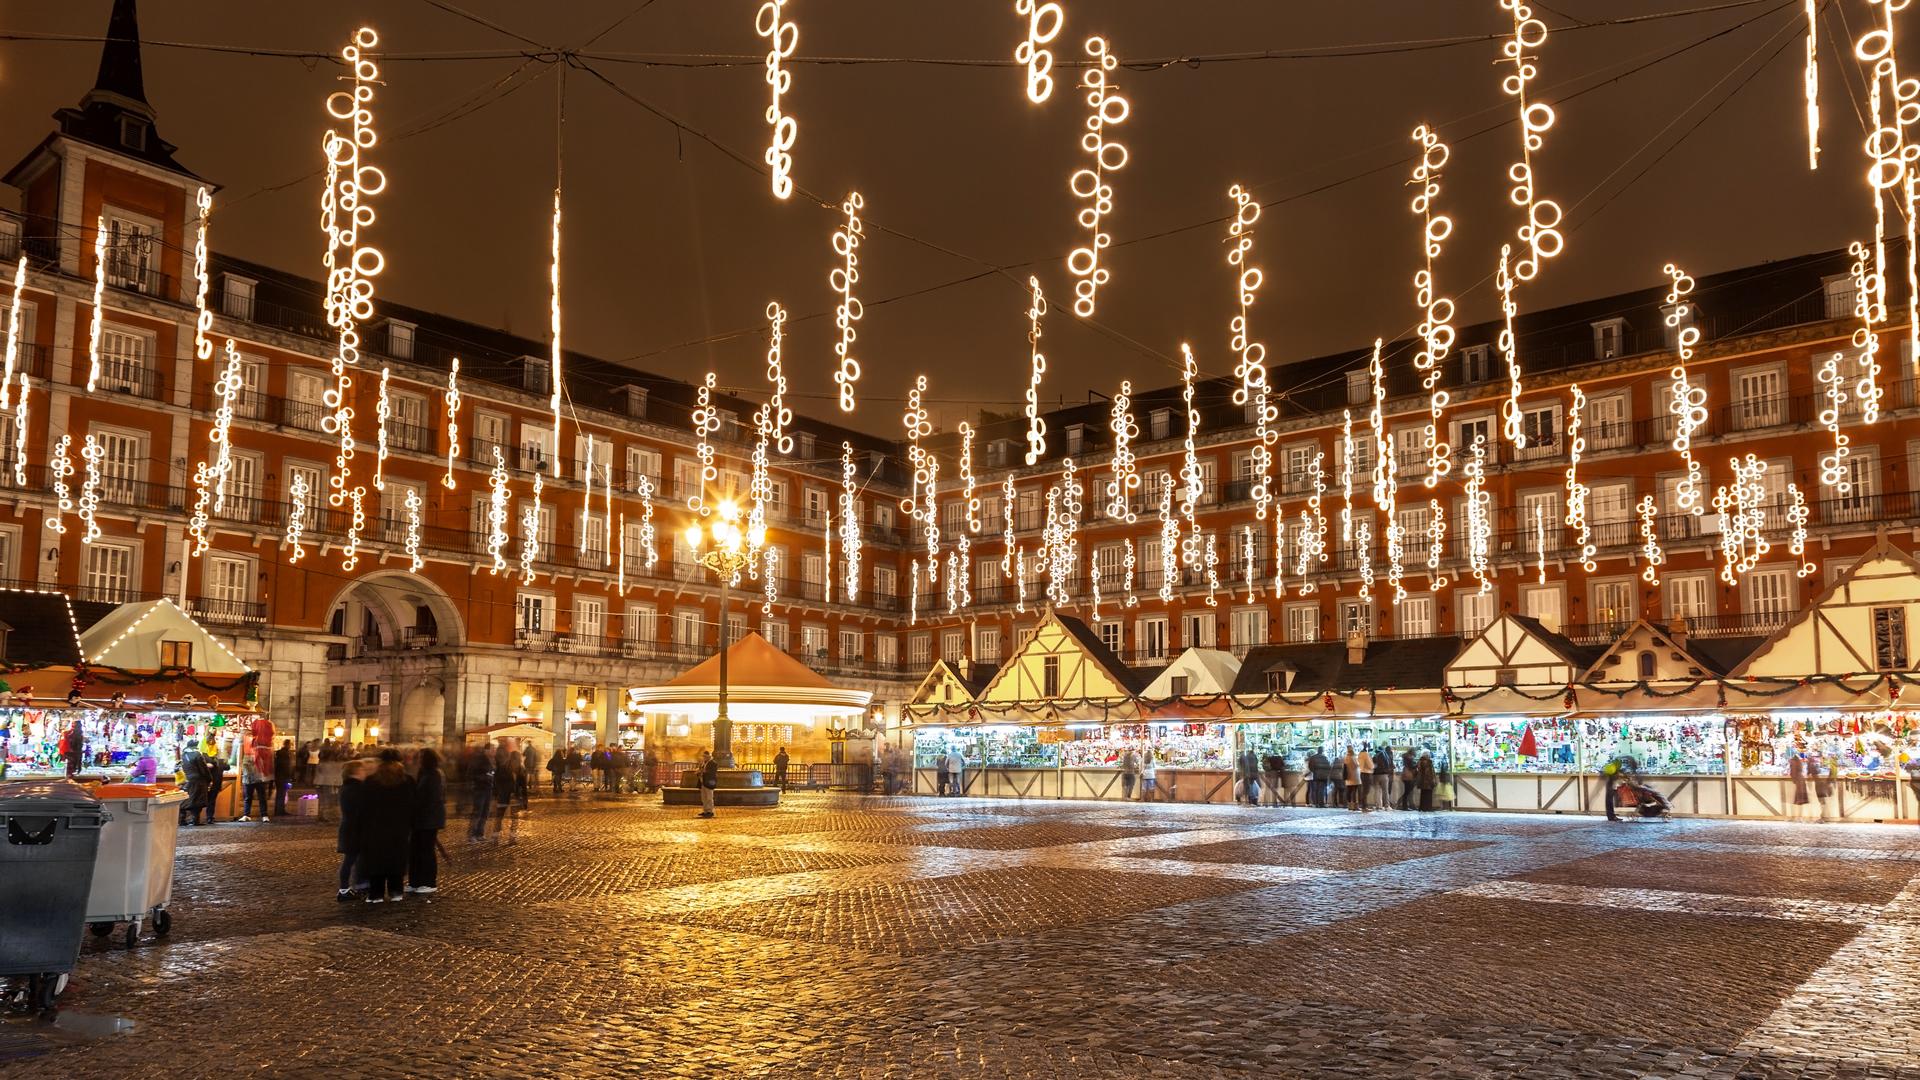 Navidad 2015 en Madrid - noticias navideñas